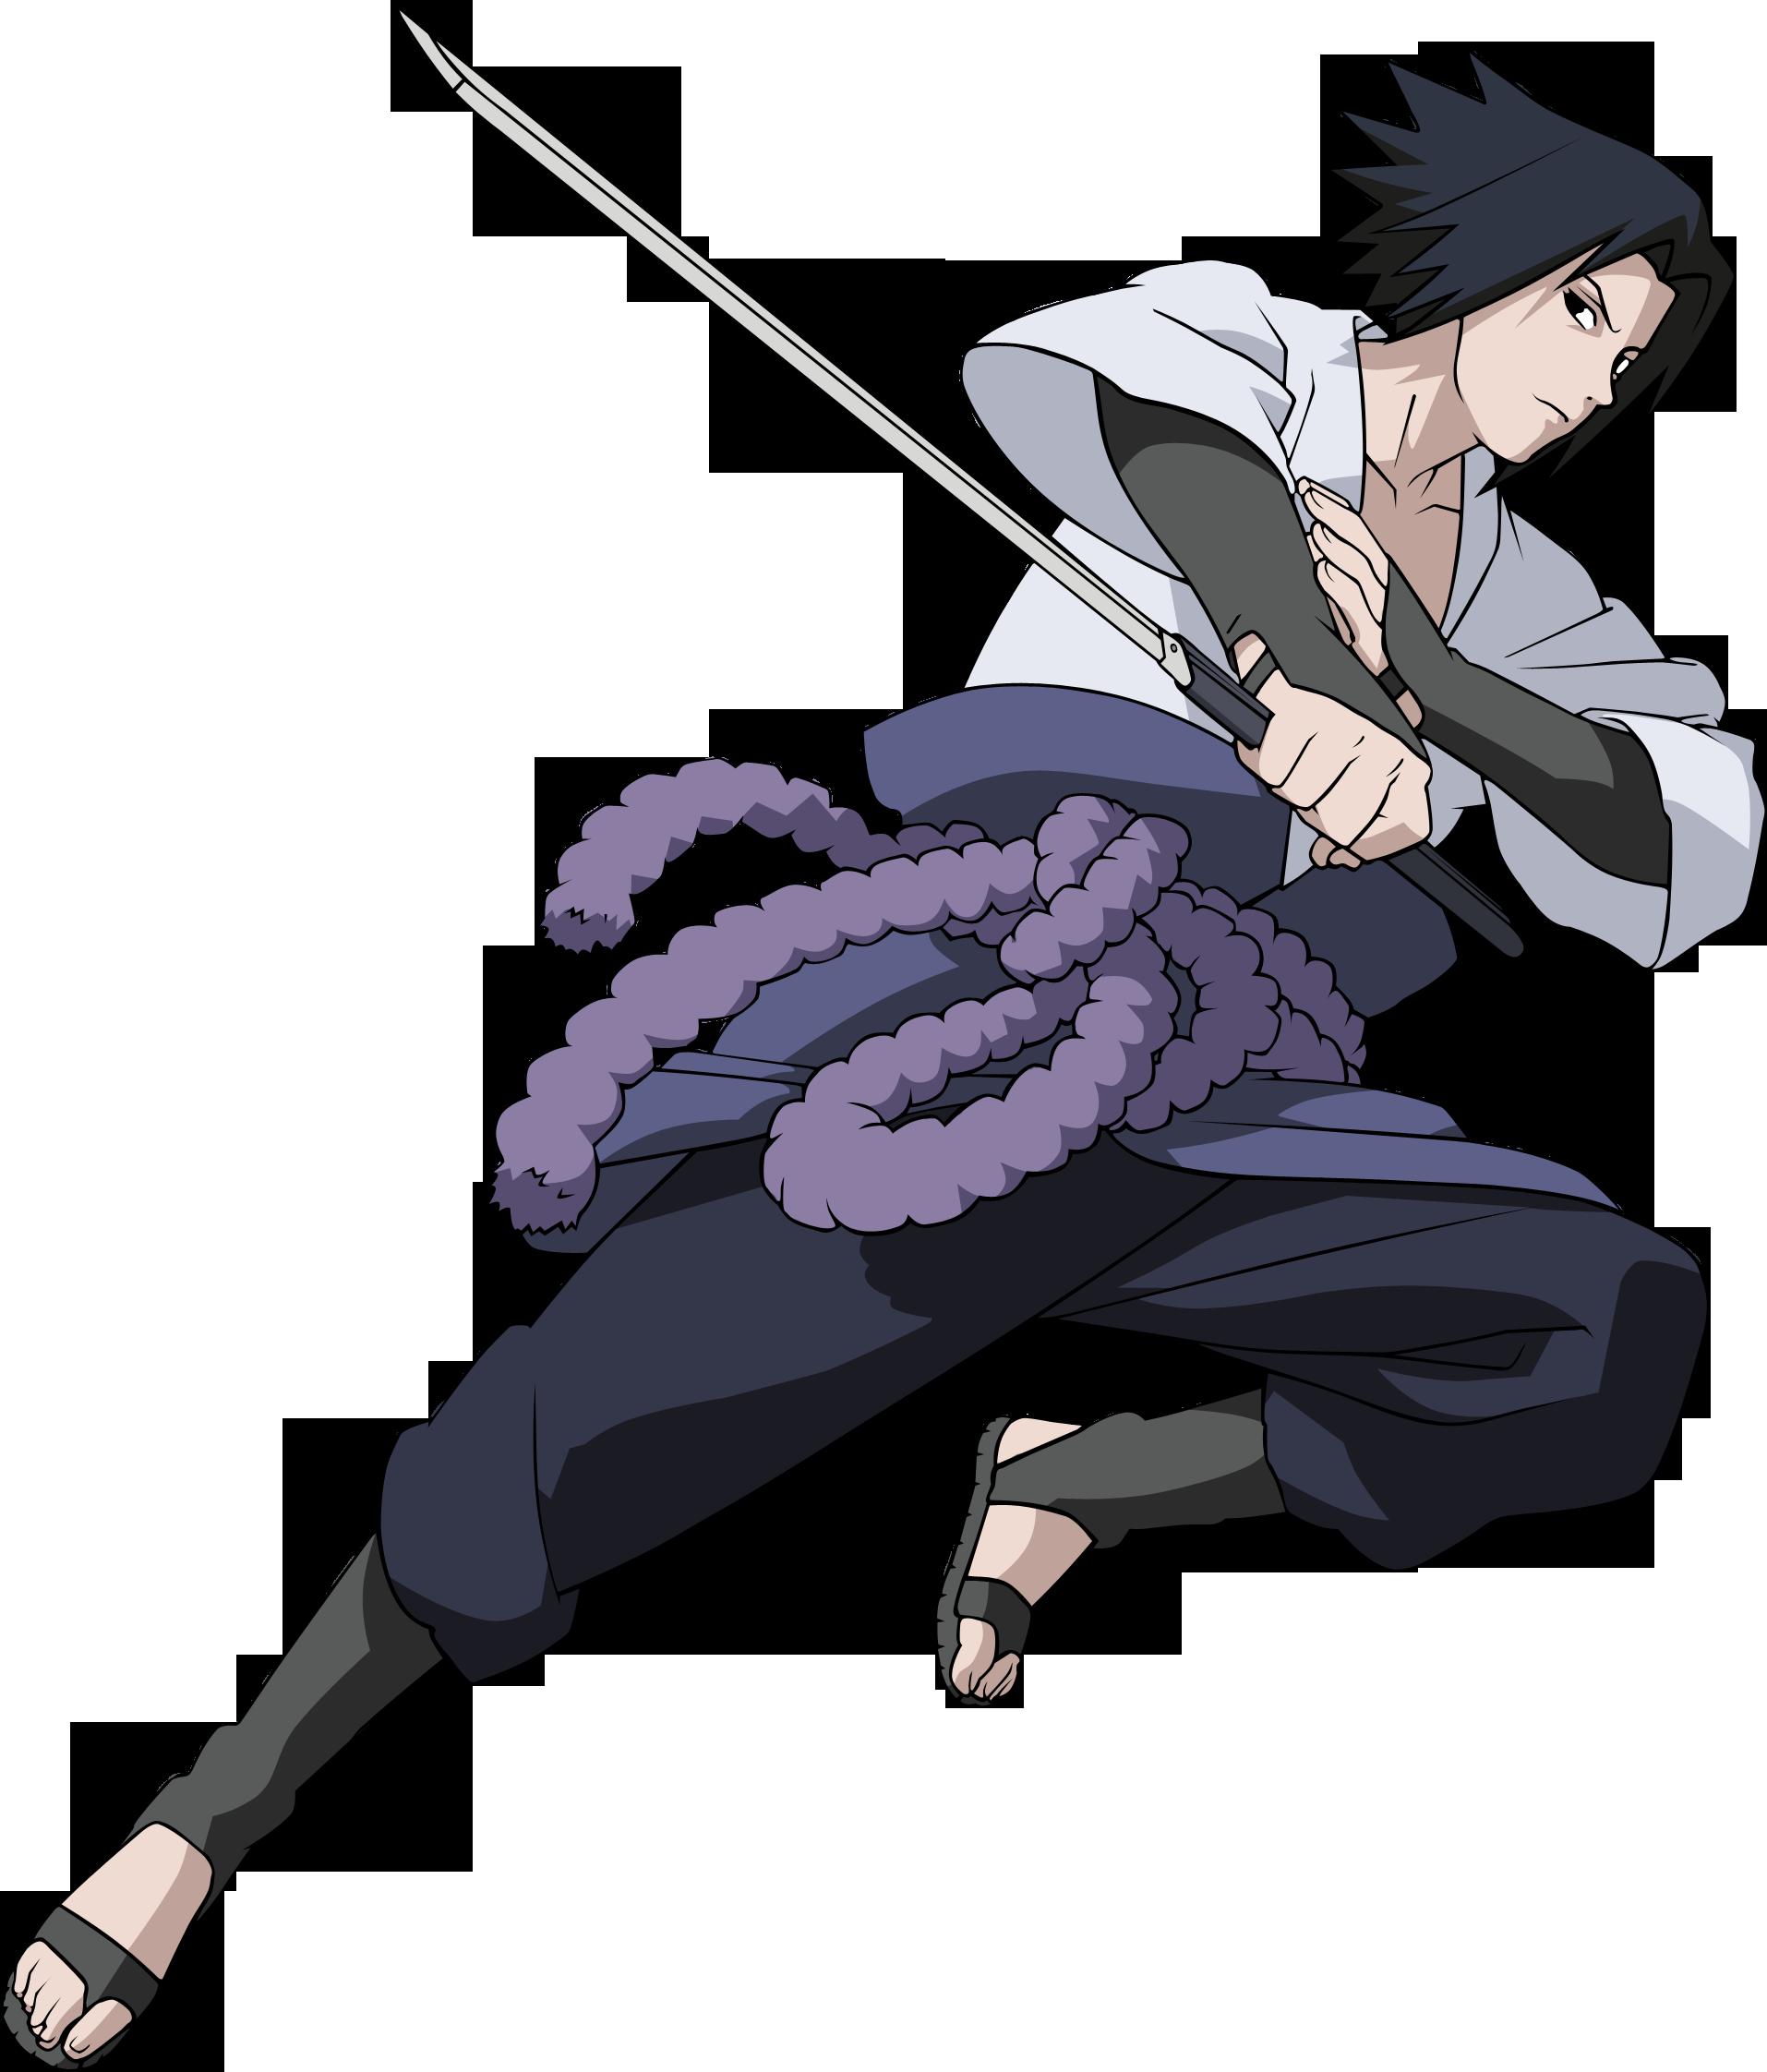 Nero VS Sasuke - Battles - Comic Vine - Dark Sasuke